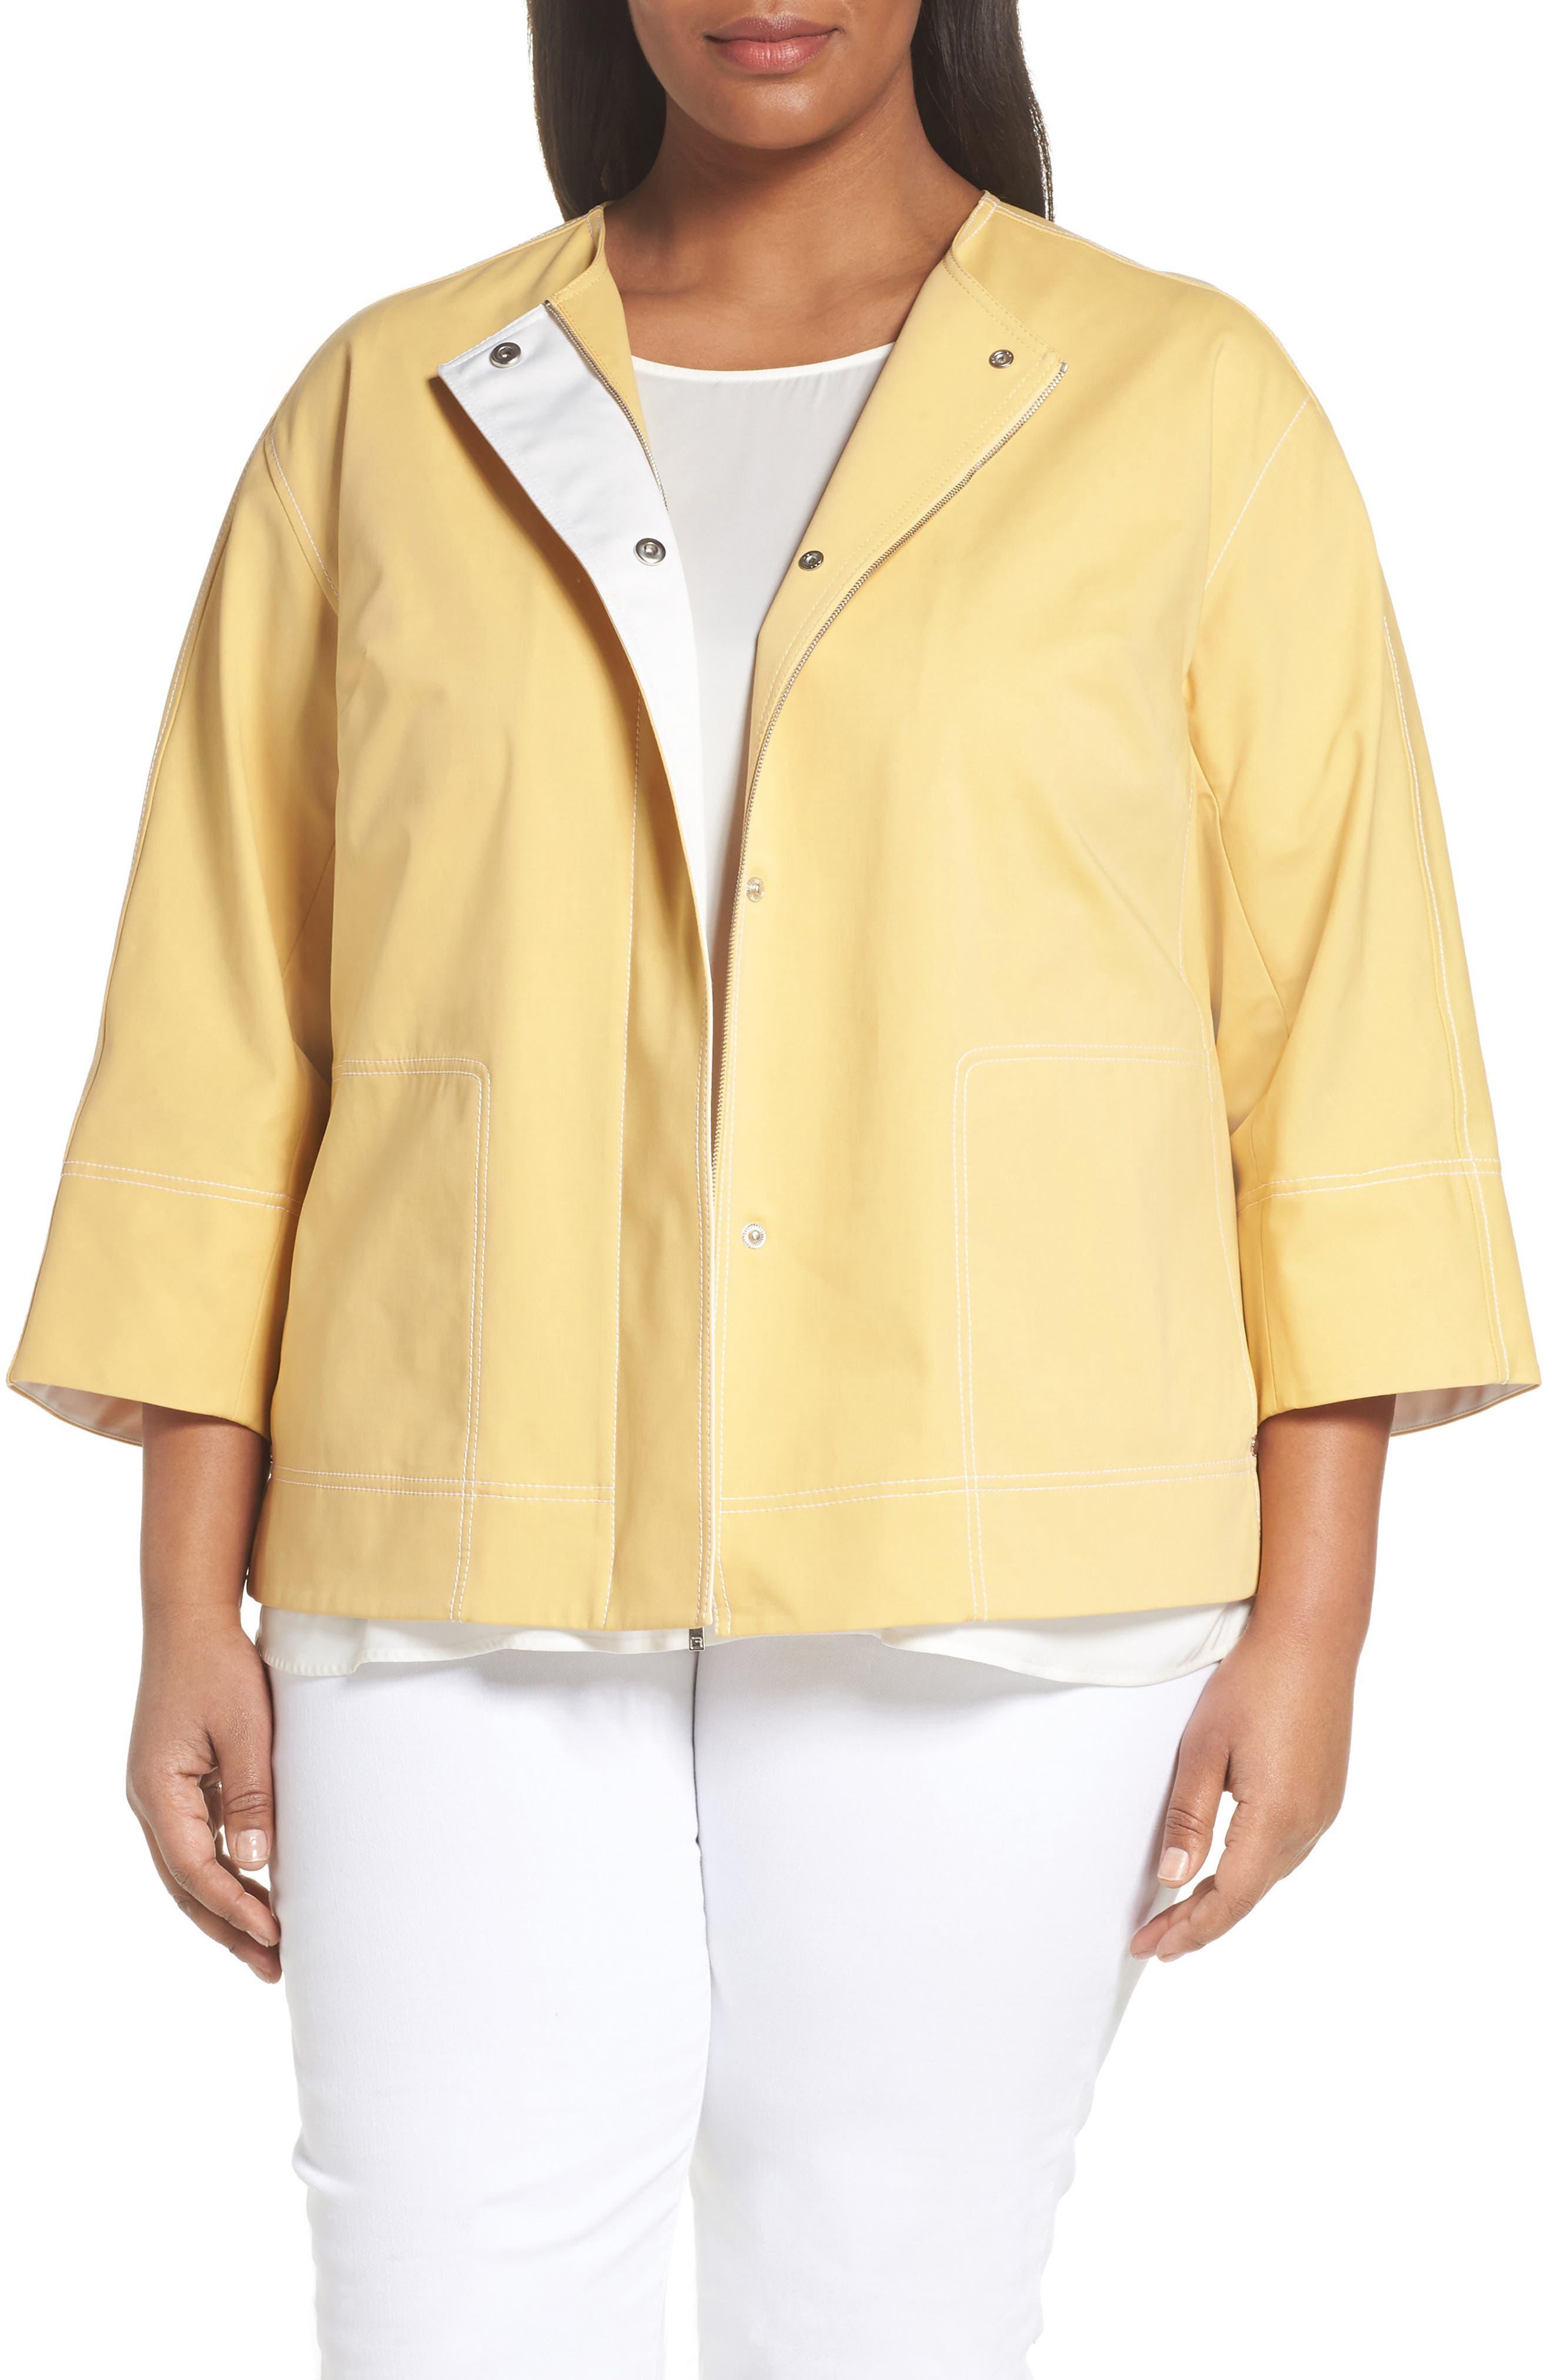 Milo Zip Jacket,                             Main thumbnail 1, color,                             Sienna Yellow